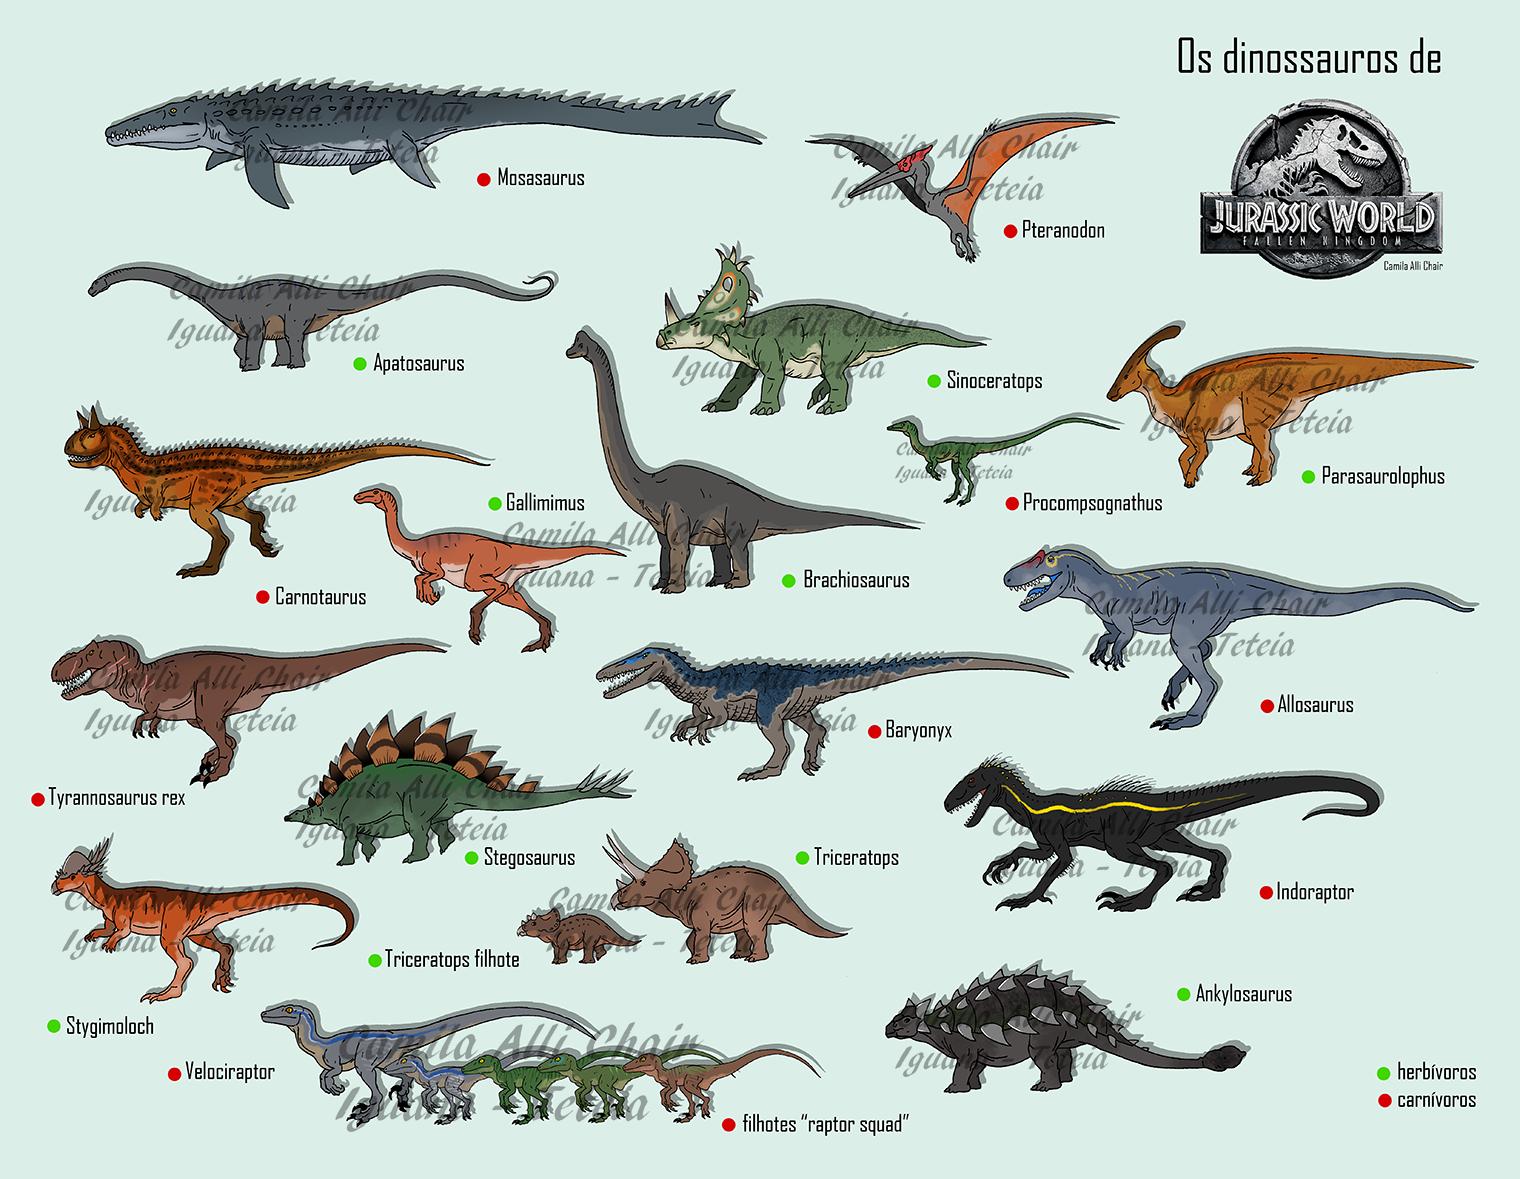 Jurassic Worlds Reino Ameacado Poster Dinosaurios Jurassic World Dinosaurios De Jurassic Park Parque Jurasico